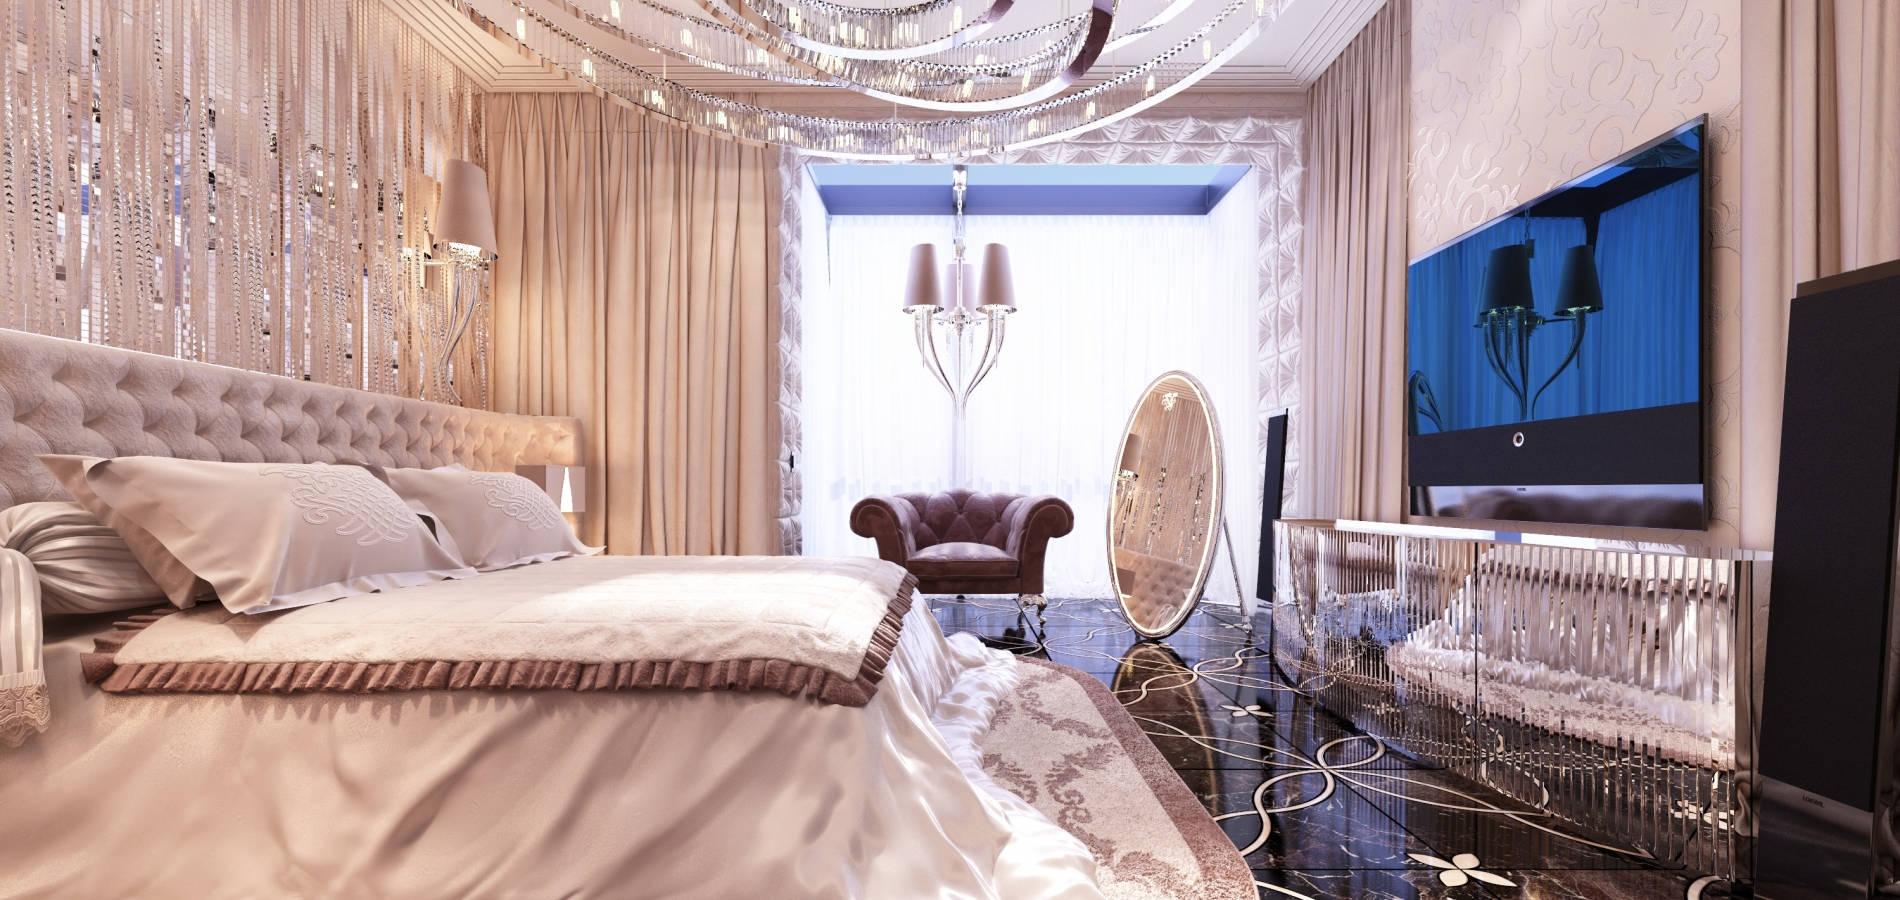 Екстравагантна спальня SMD_201